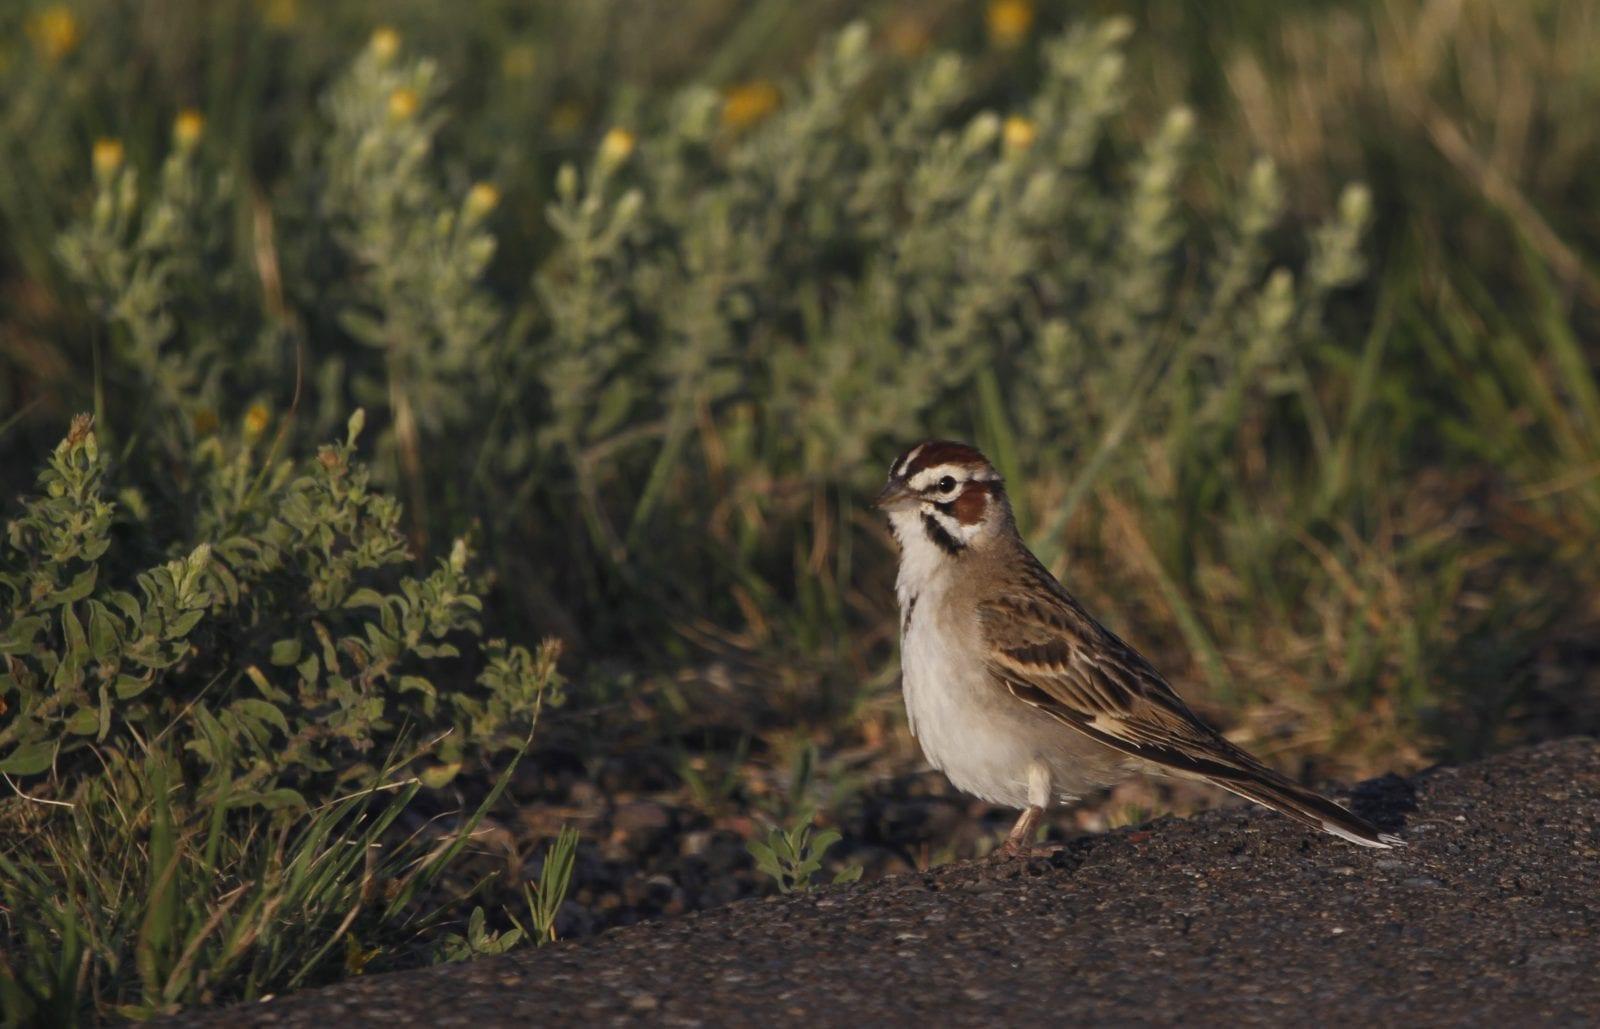 Bird Viewing at John Martin Reservoir, Colorado